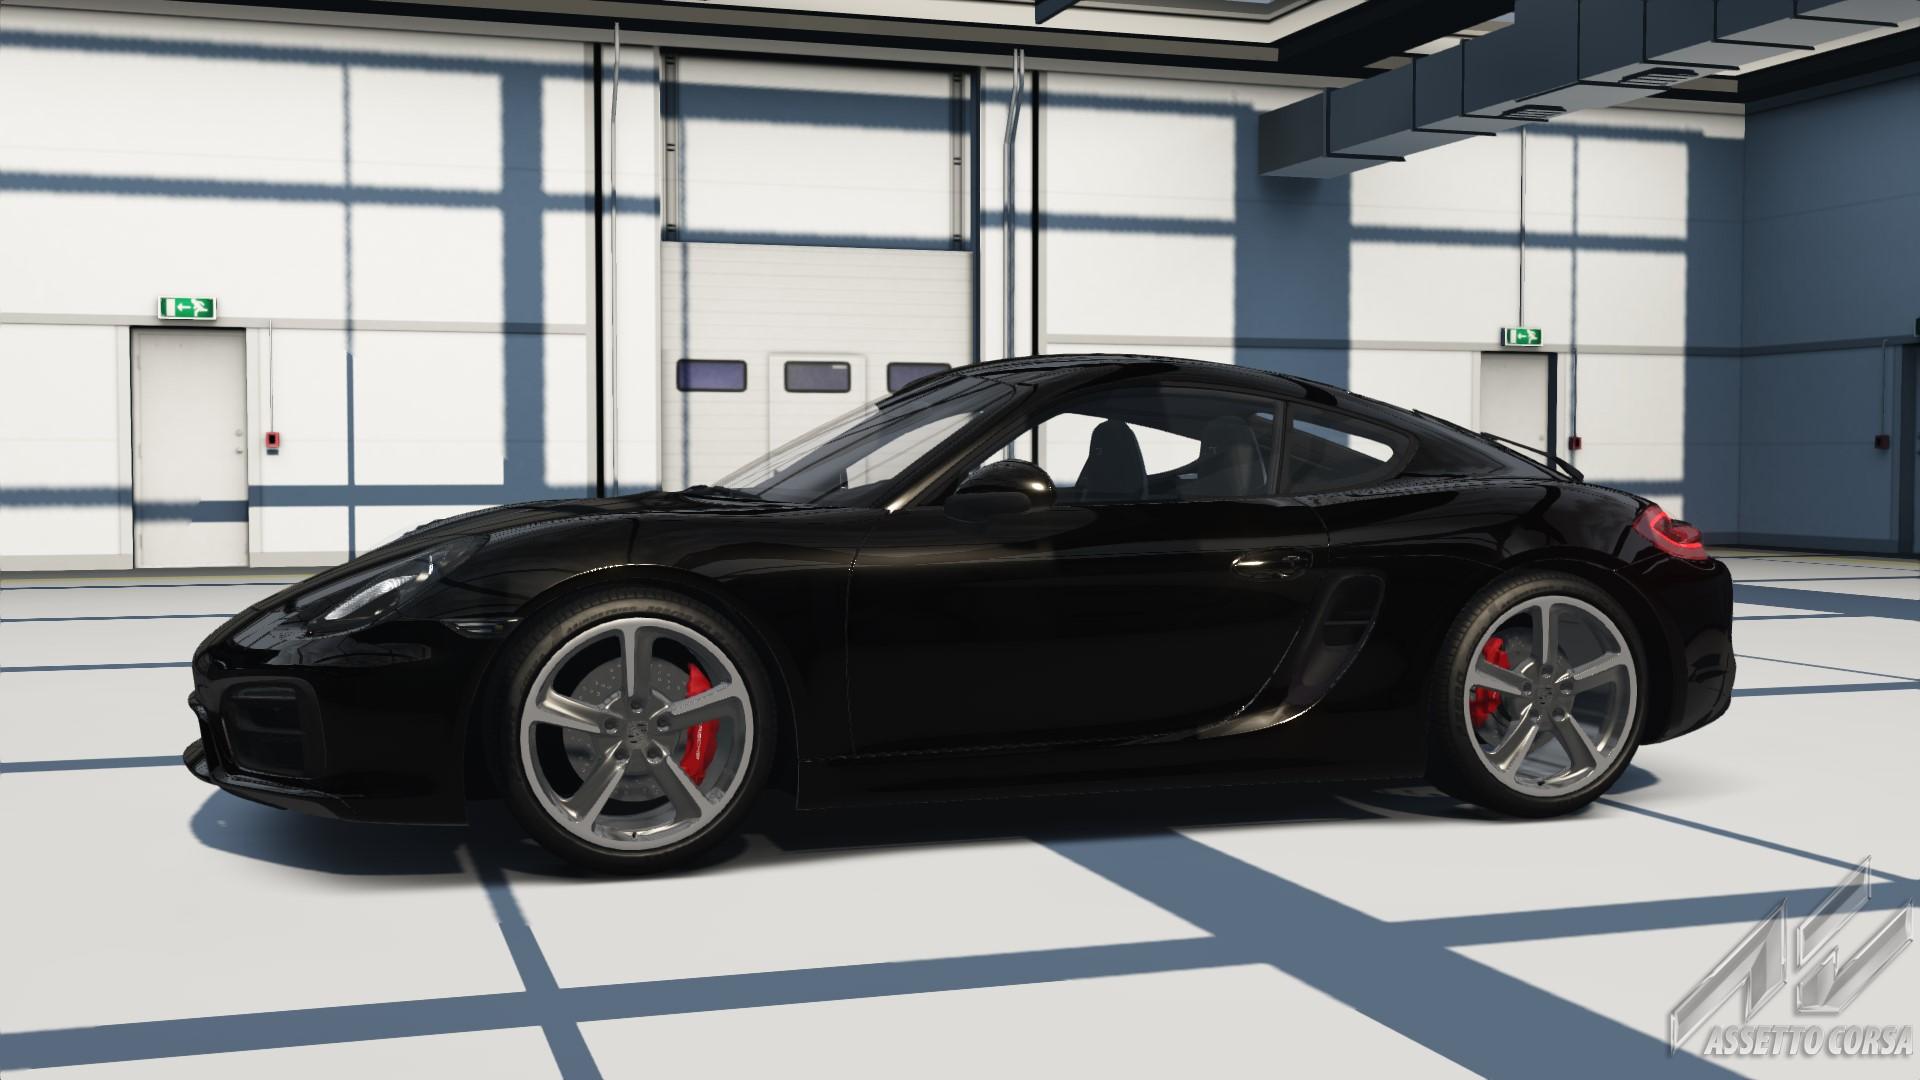 918 spyder porsche car detail assetto corsa database. Black Bedroom Furniture Sets. Home Design Ideas